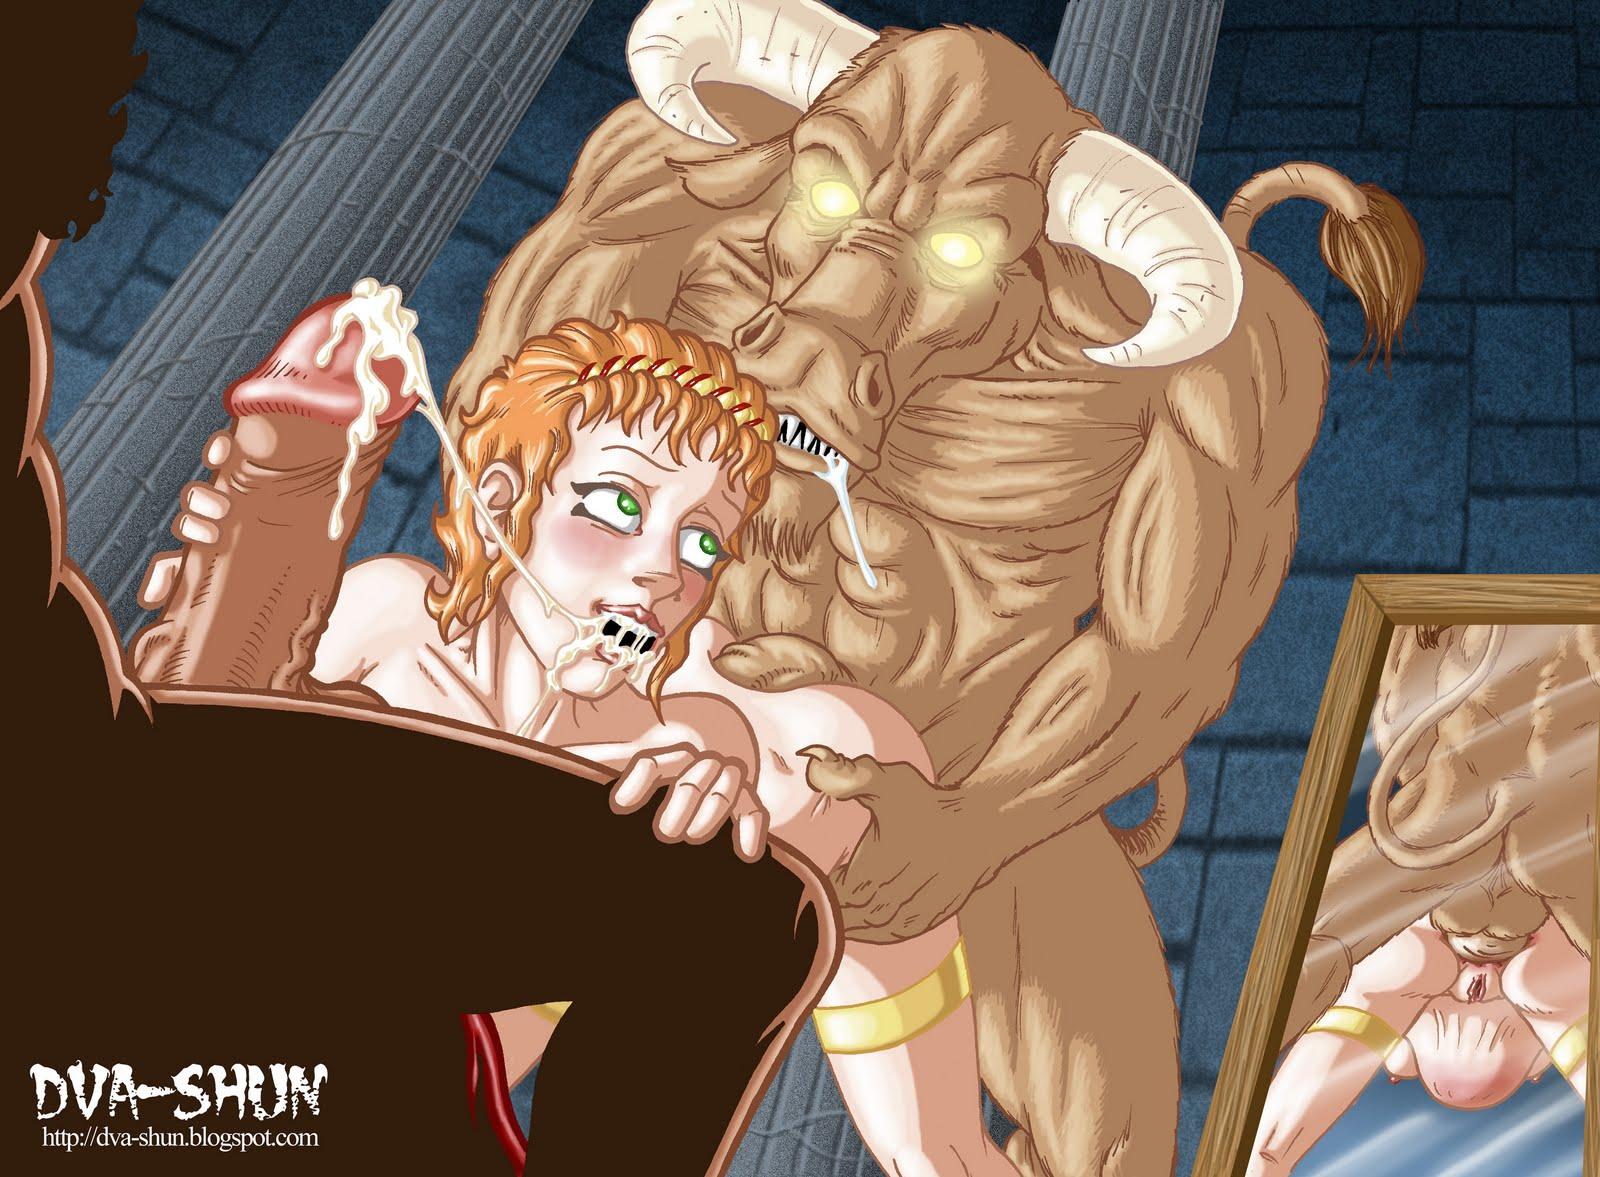 Minotaur slaves hentai xxx pic